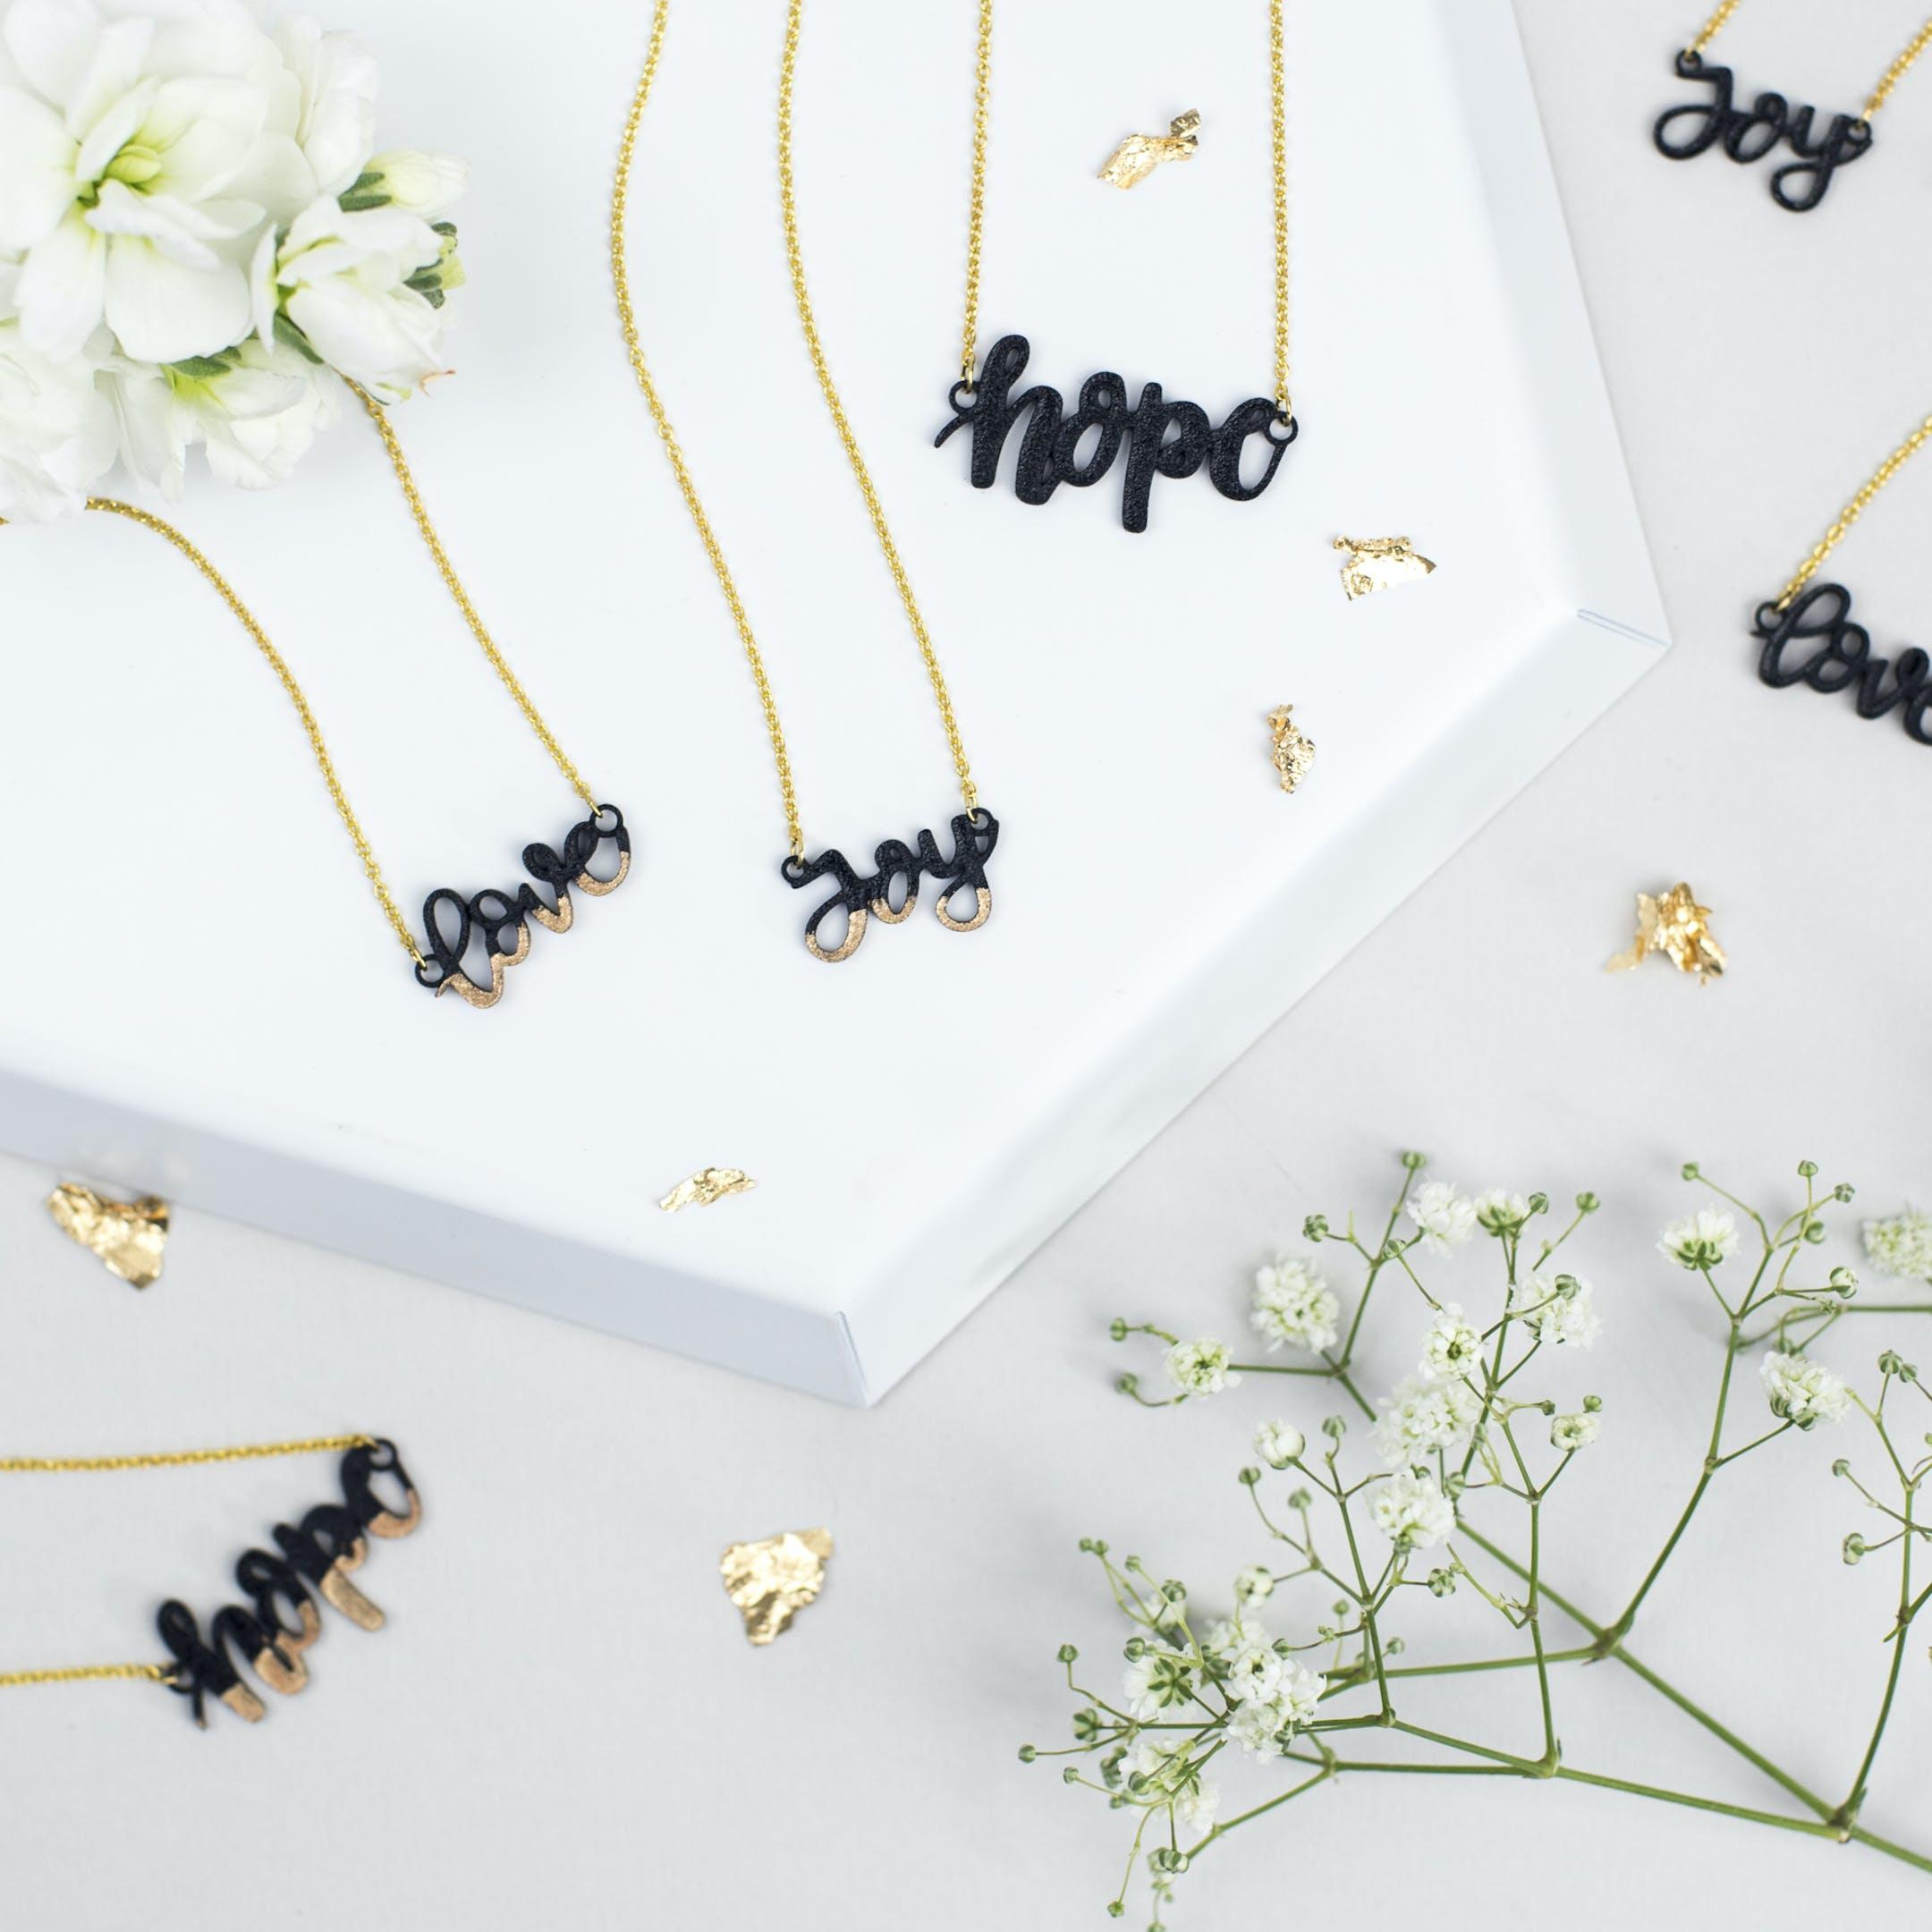 Love Joy Hope Necklaces - Izzy and Pop - Bloom Jewellery